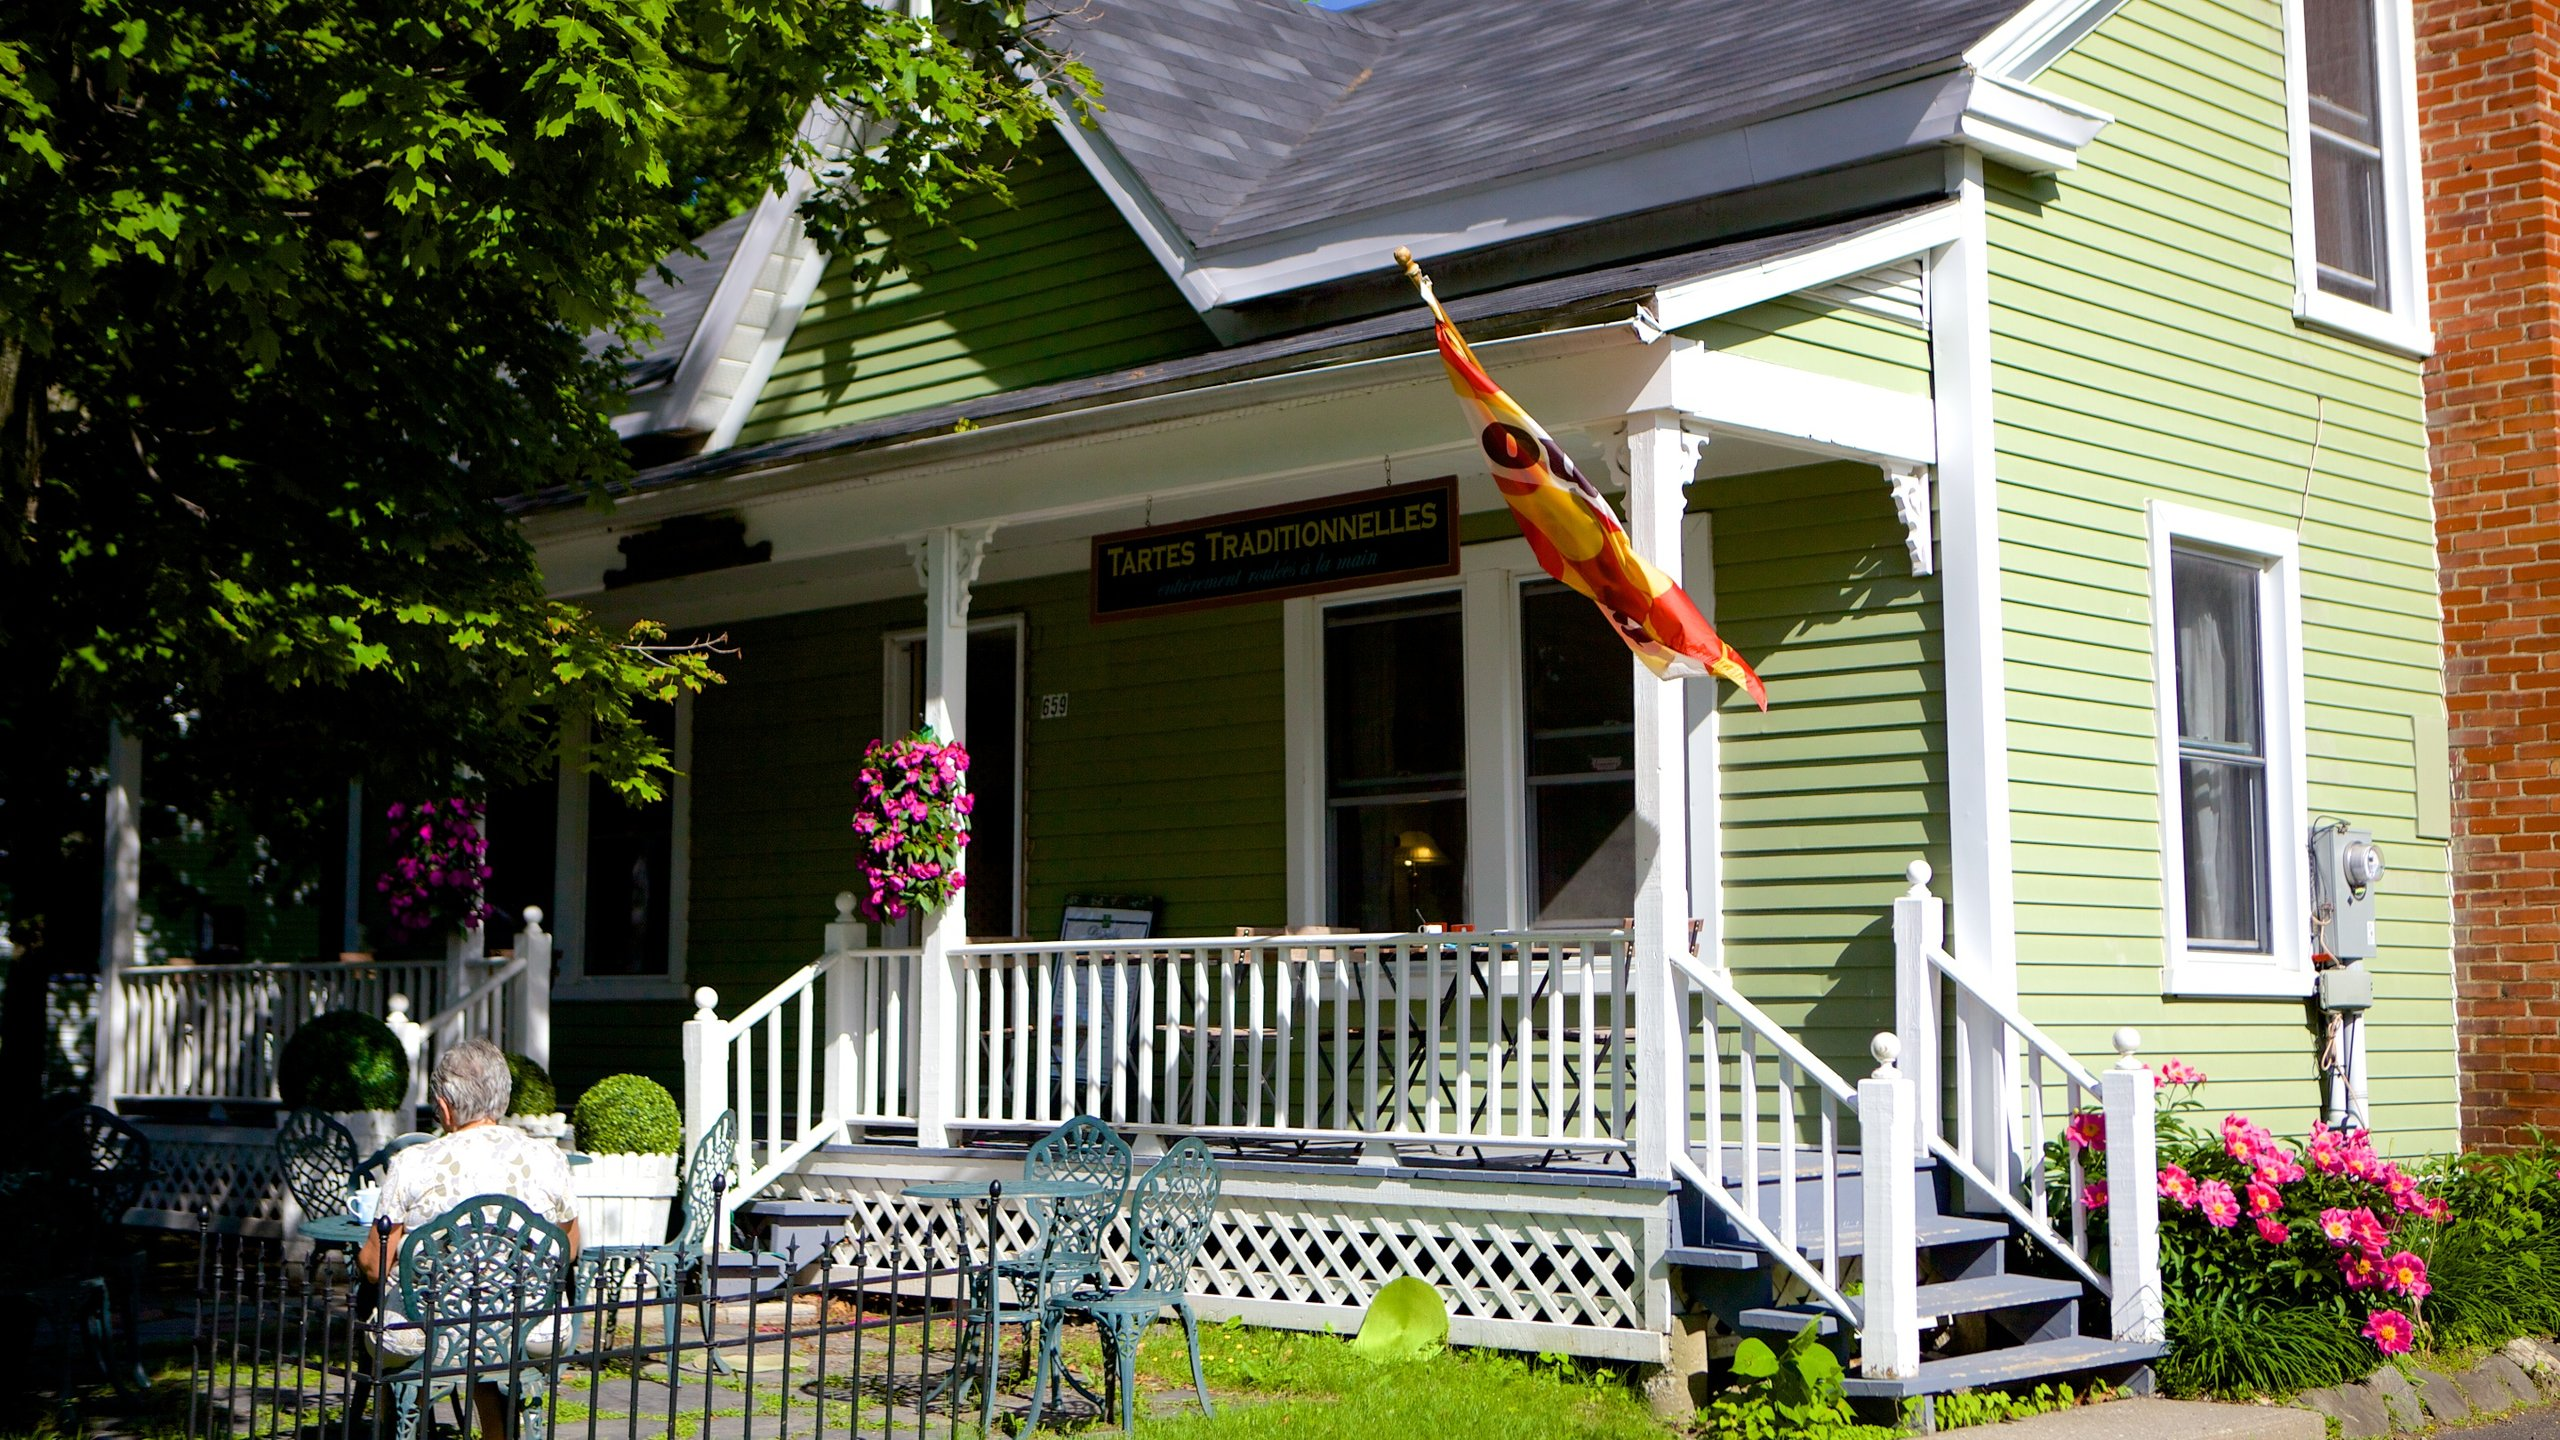 Brome-Missisquoi Regional County Municipality, Quebec, Canada